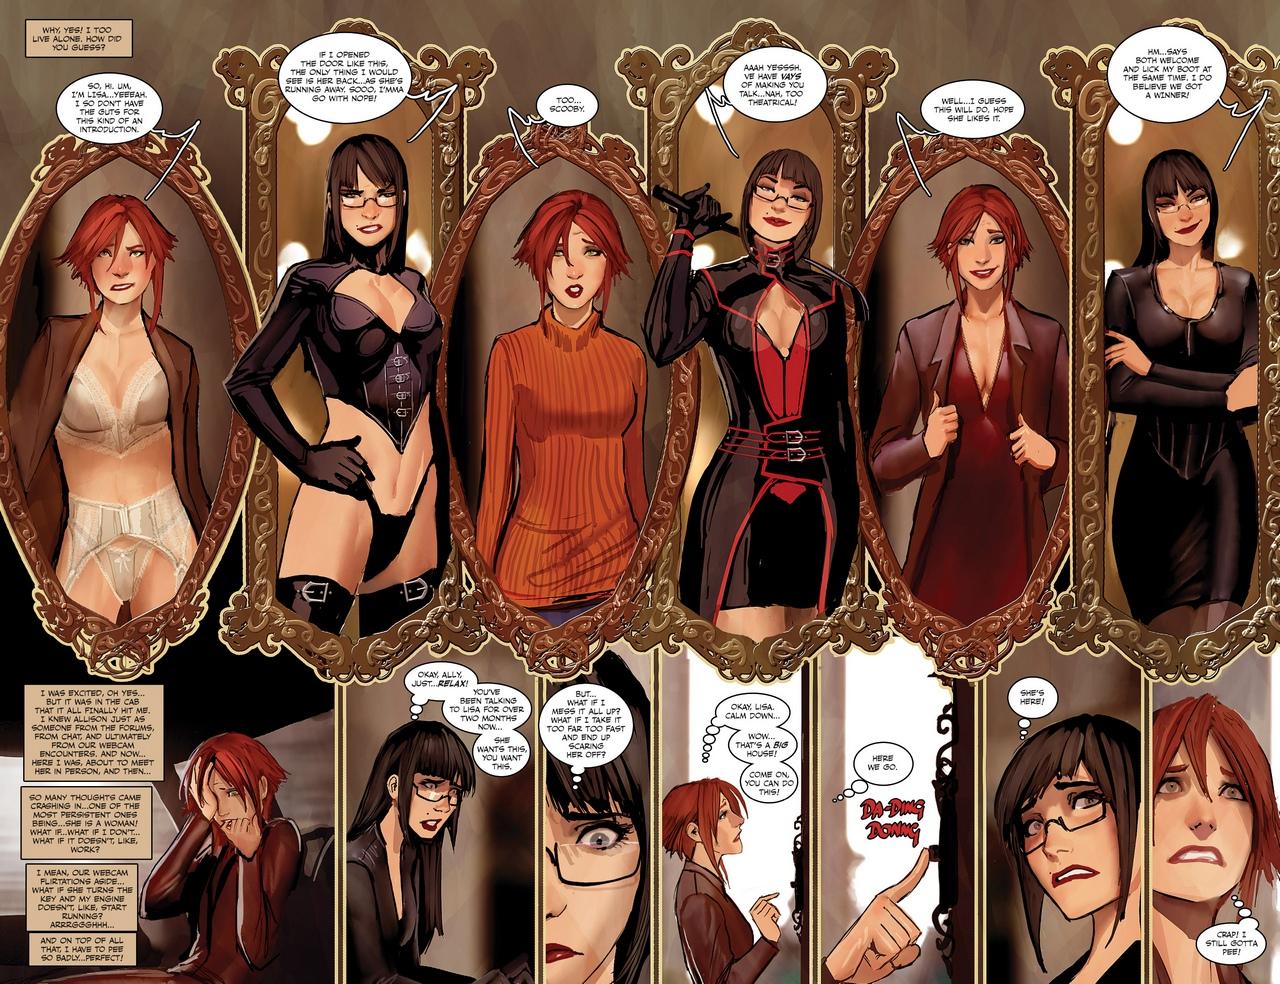 Sunstone-1 23 free sex comic